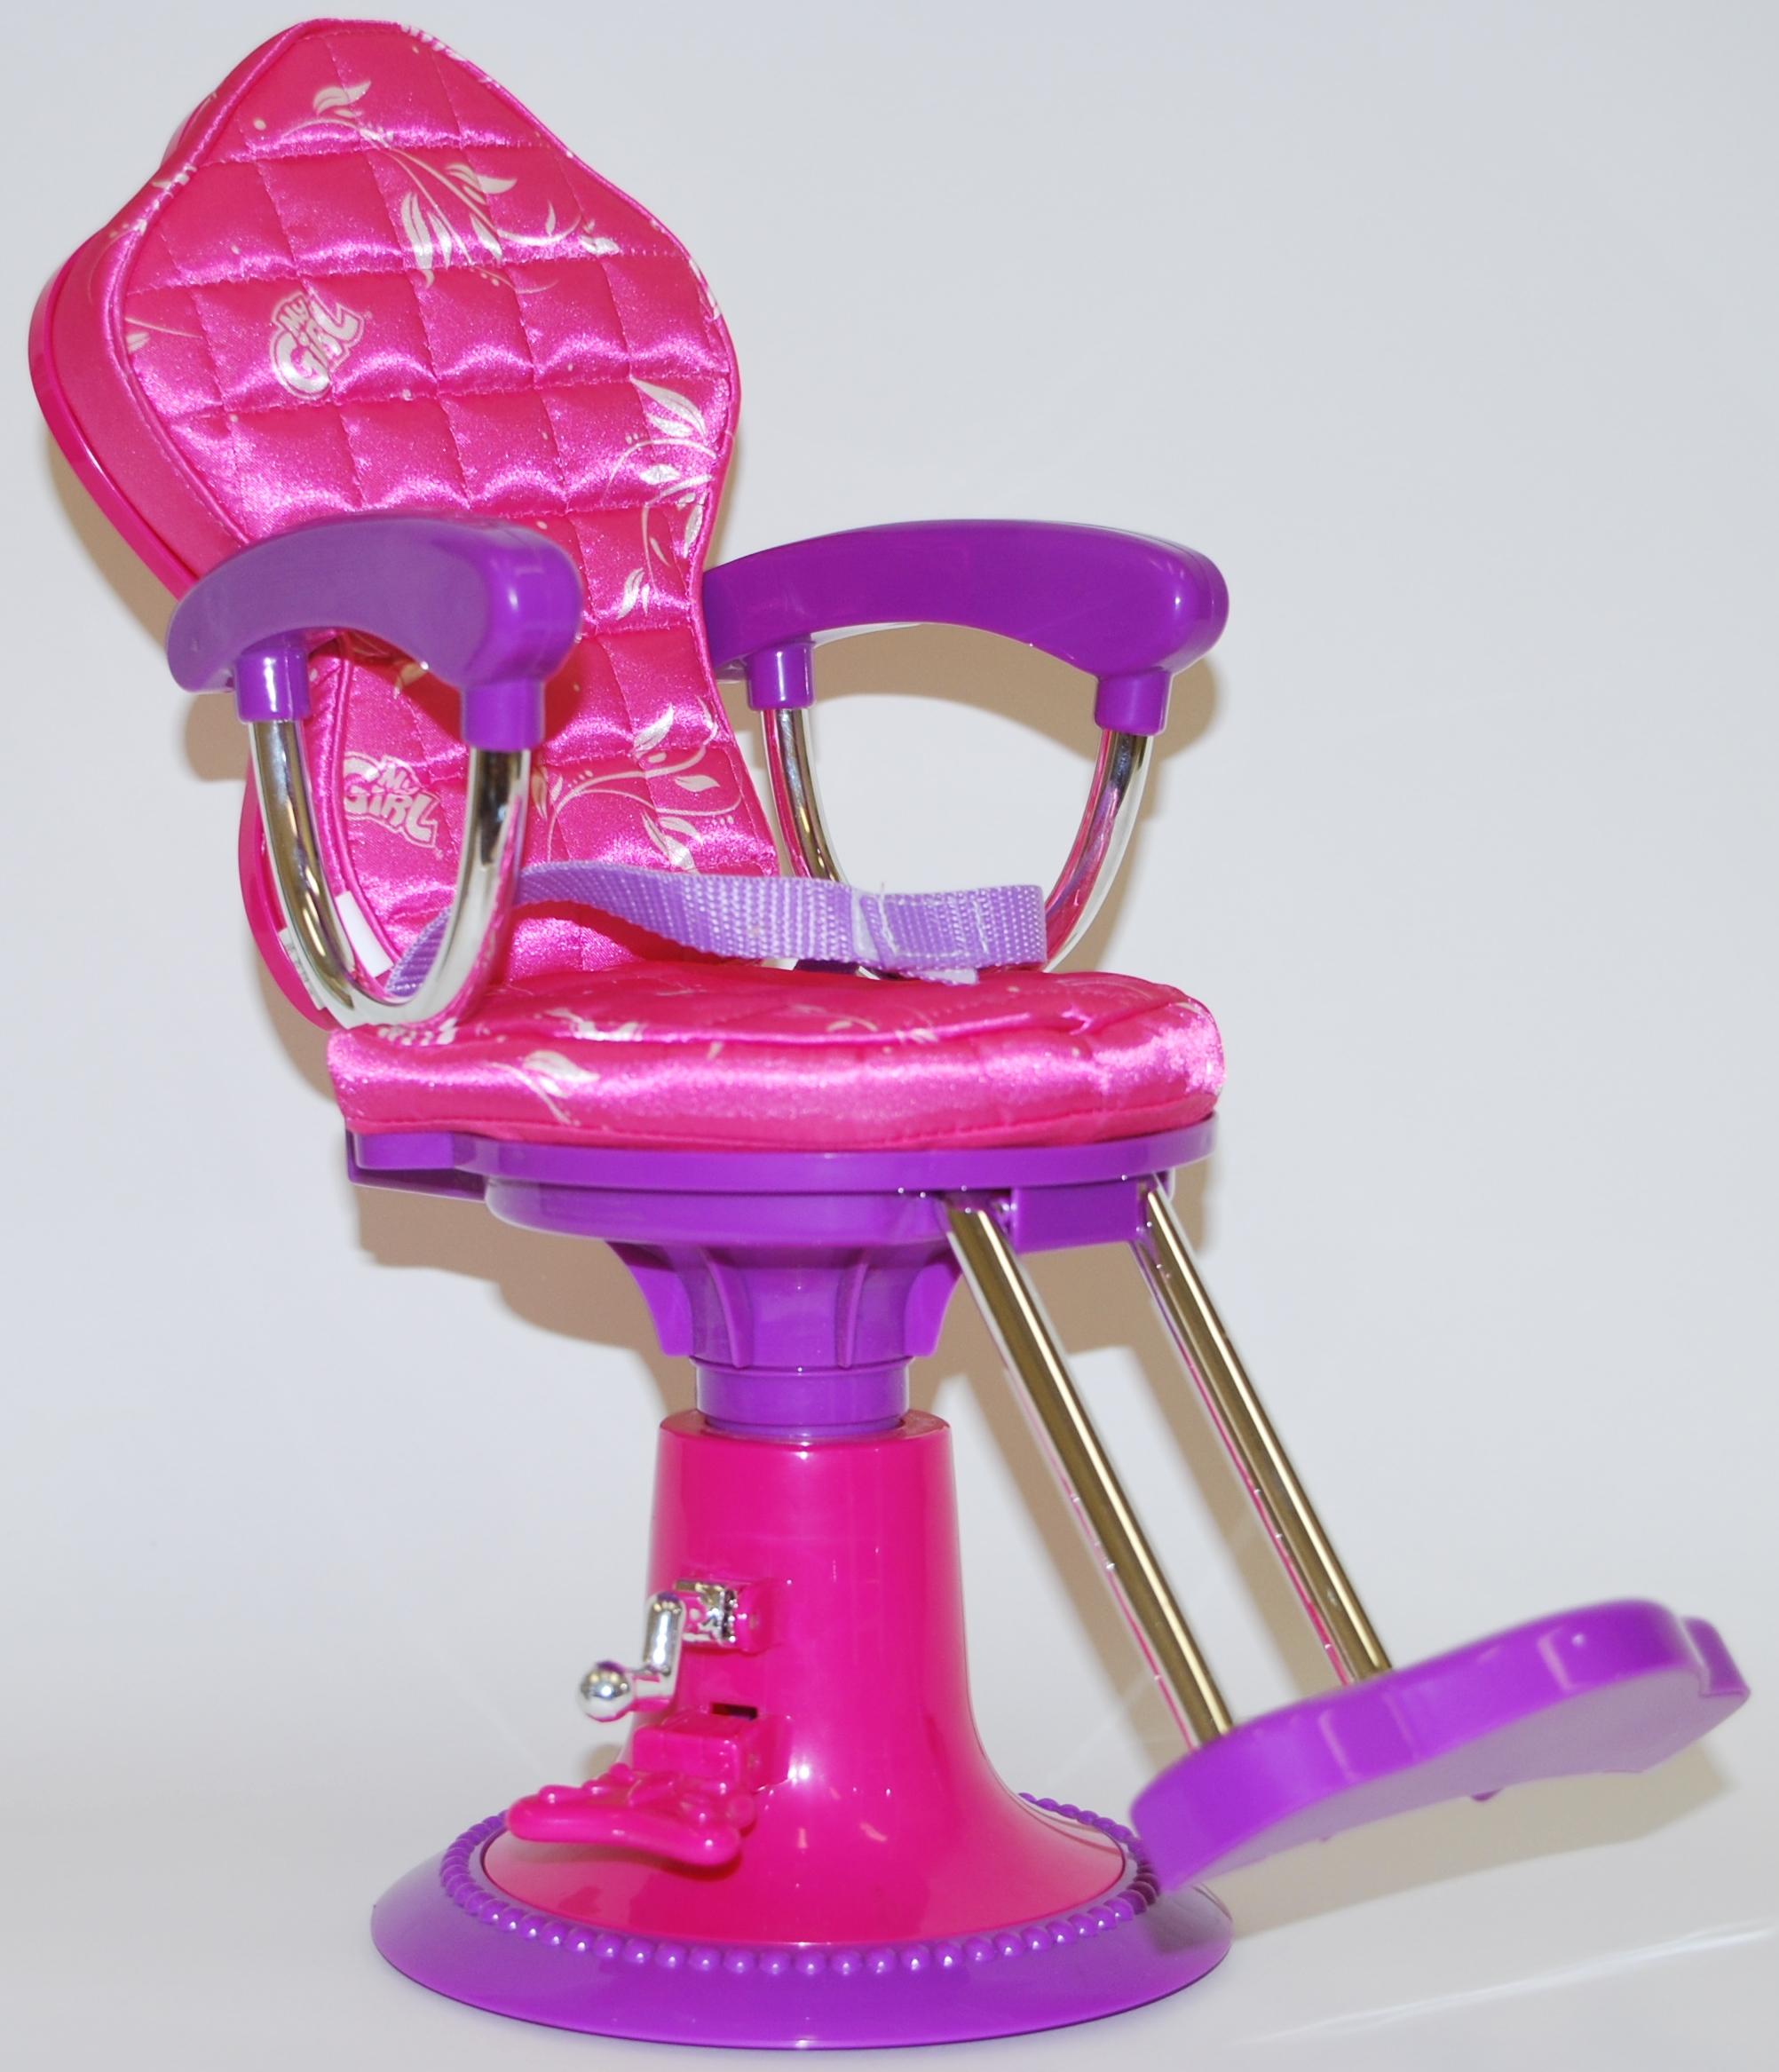 doll salon chair hanging garden upc 643012053383 my girl for american